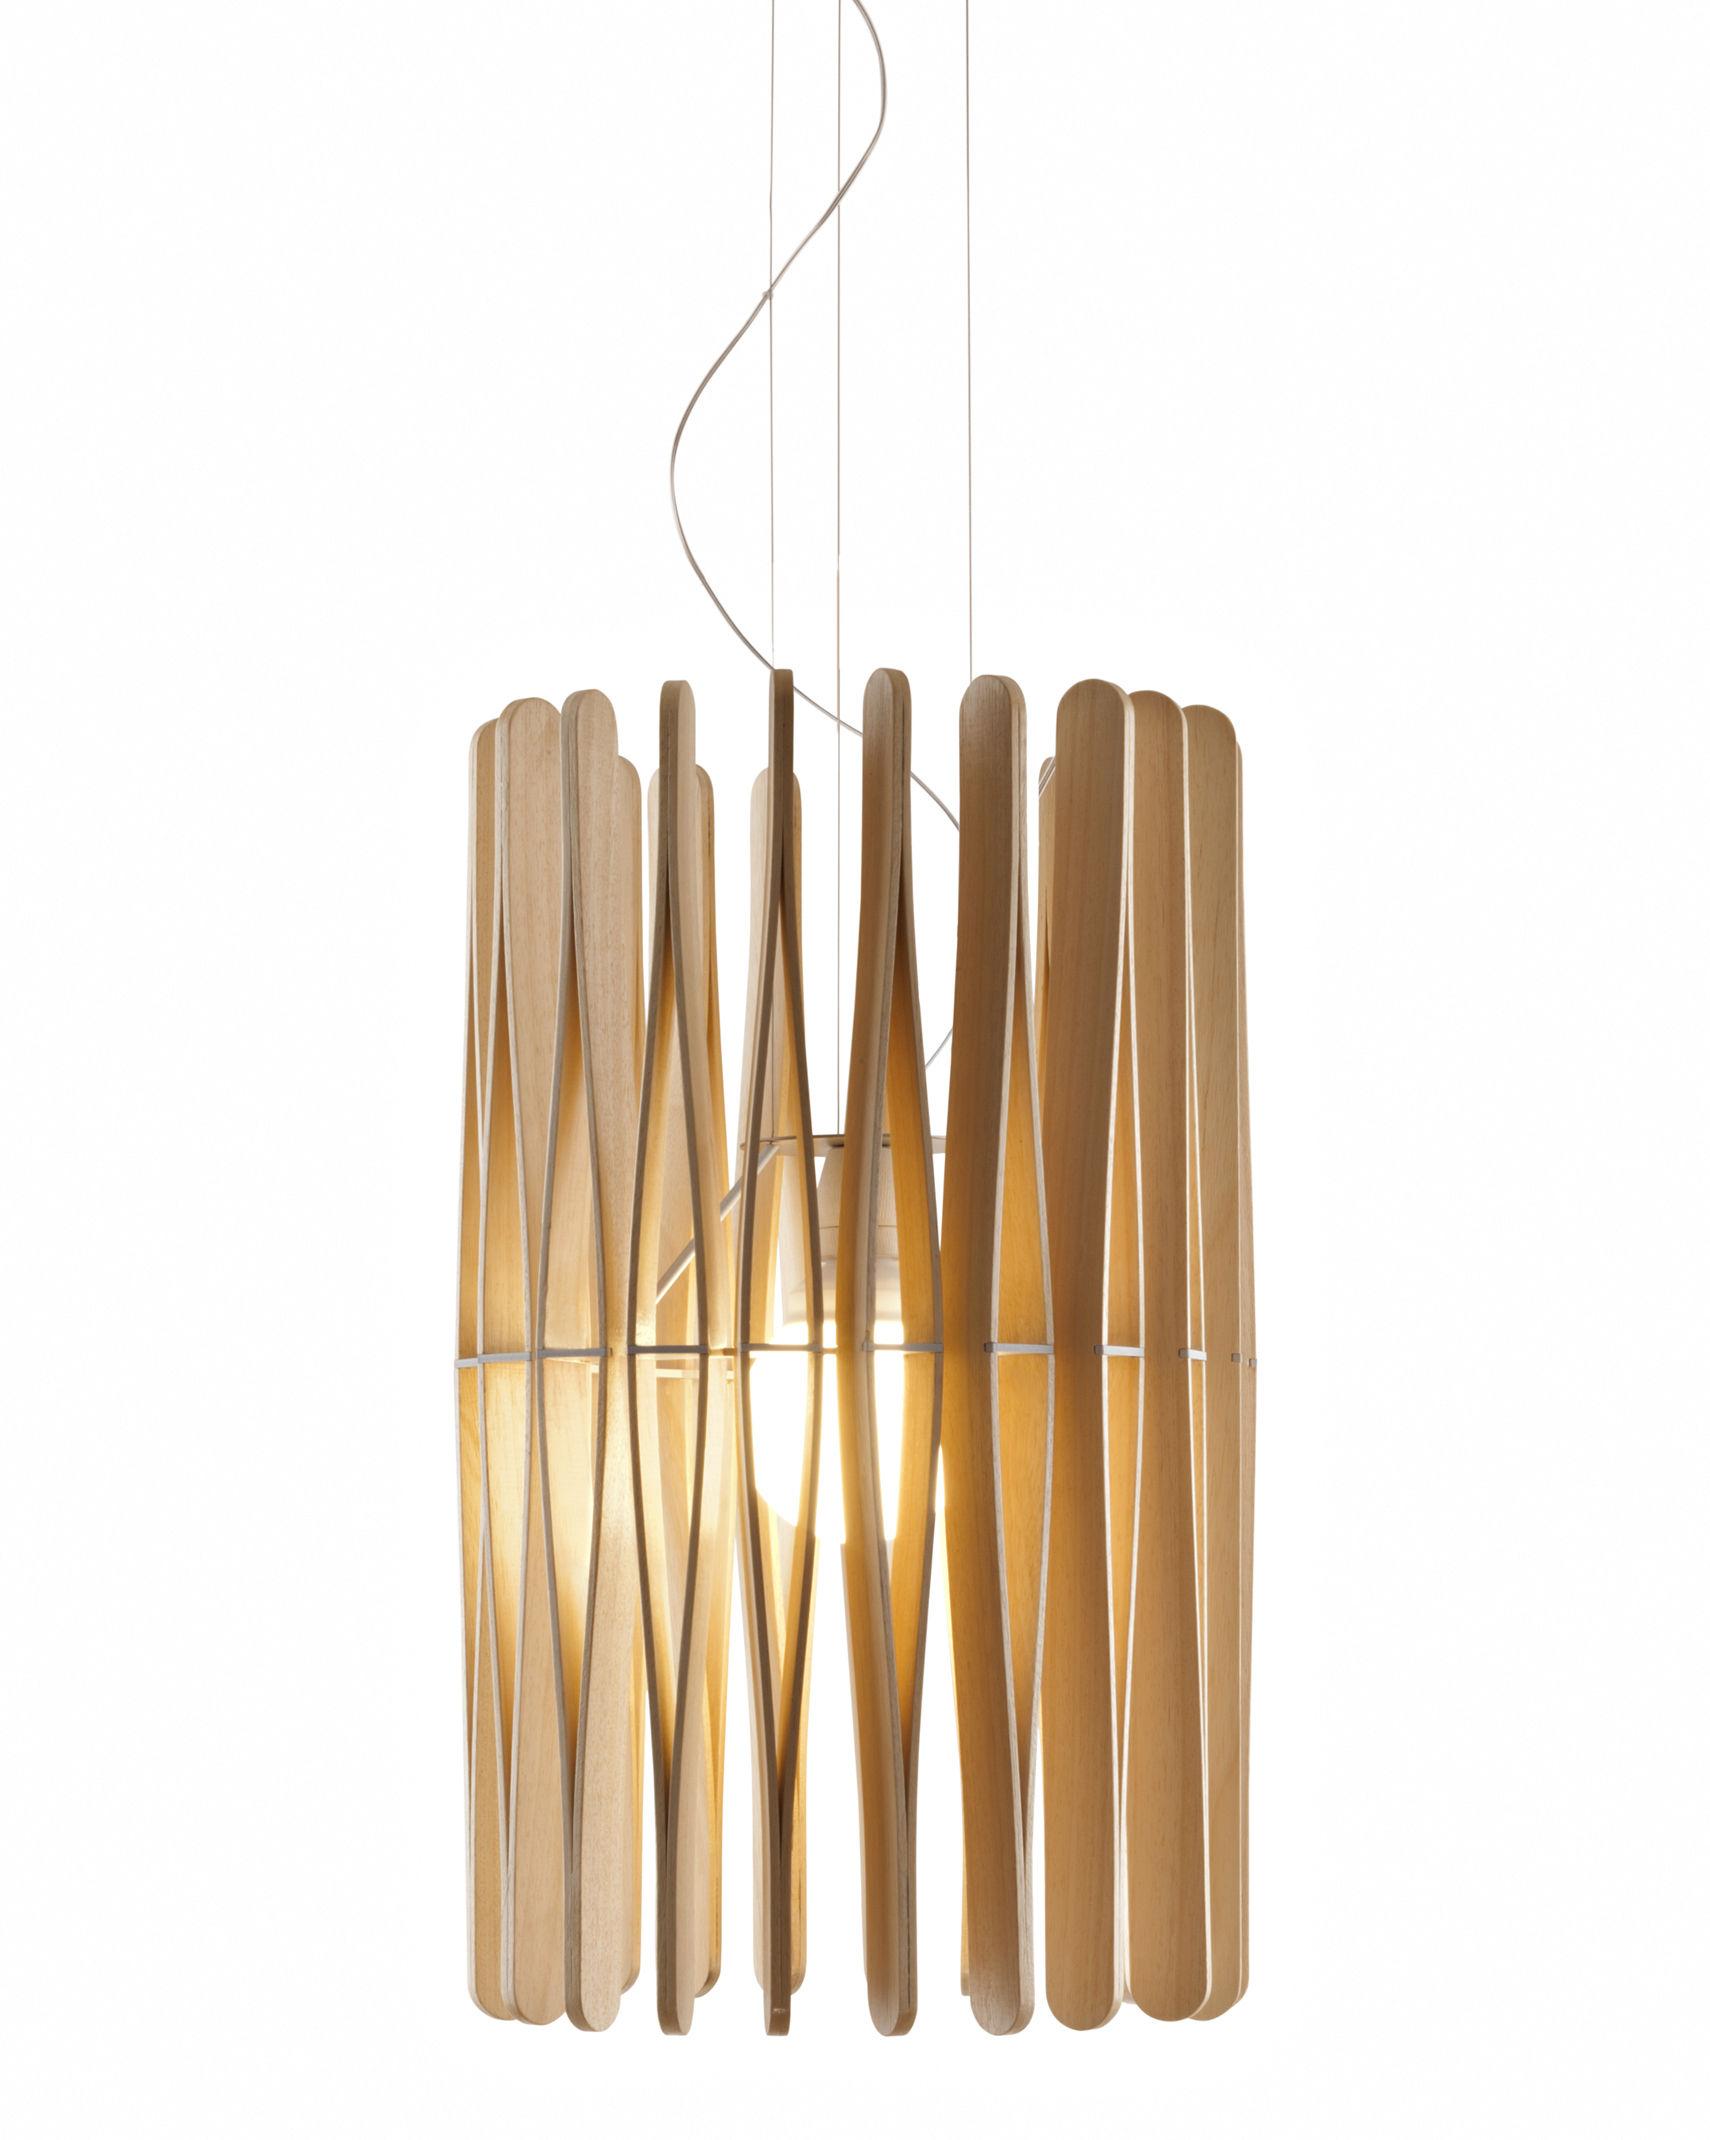 Leuchten - Pendelleuchten - Stick 02 Pendelleuchte / Ø 43 x H 65 cm - Fabbian - Holz, hell / Modell 2 - Bois Ayous, lackiertes Metall